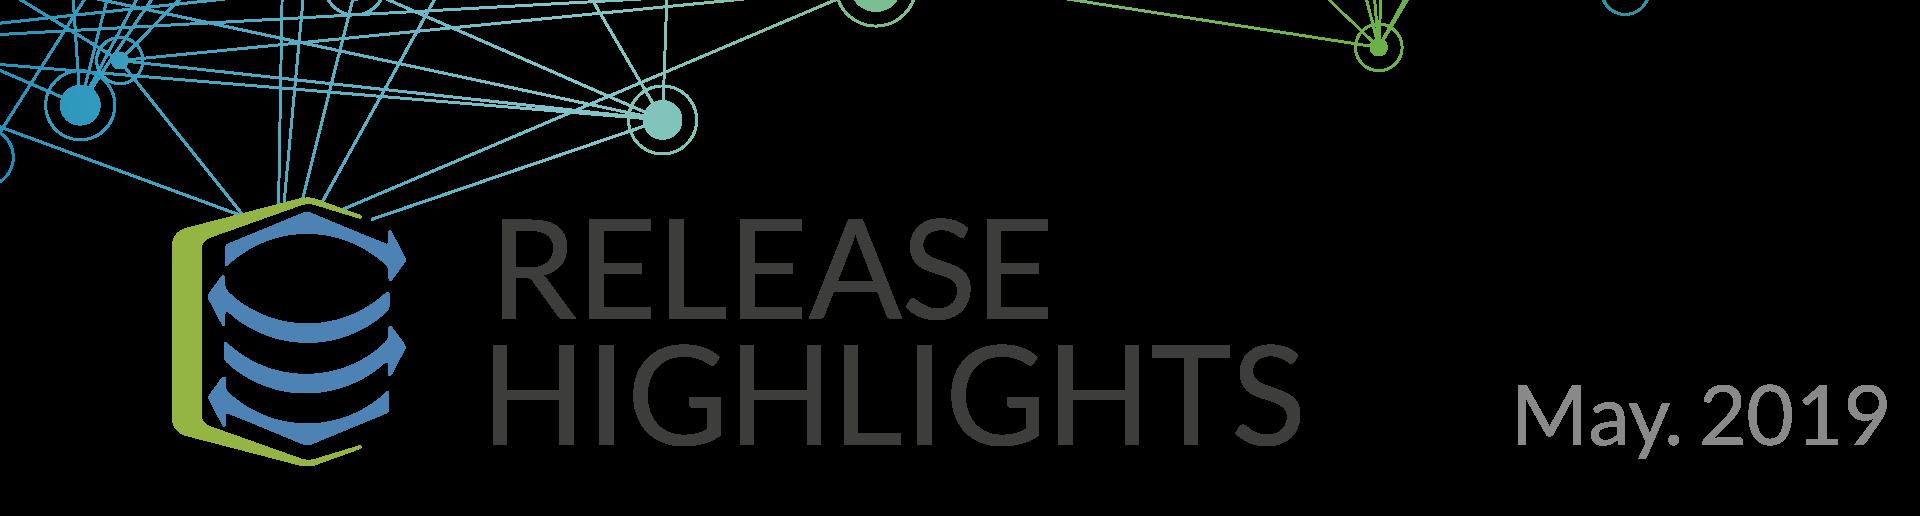 highlights_header.png